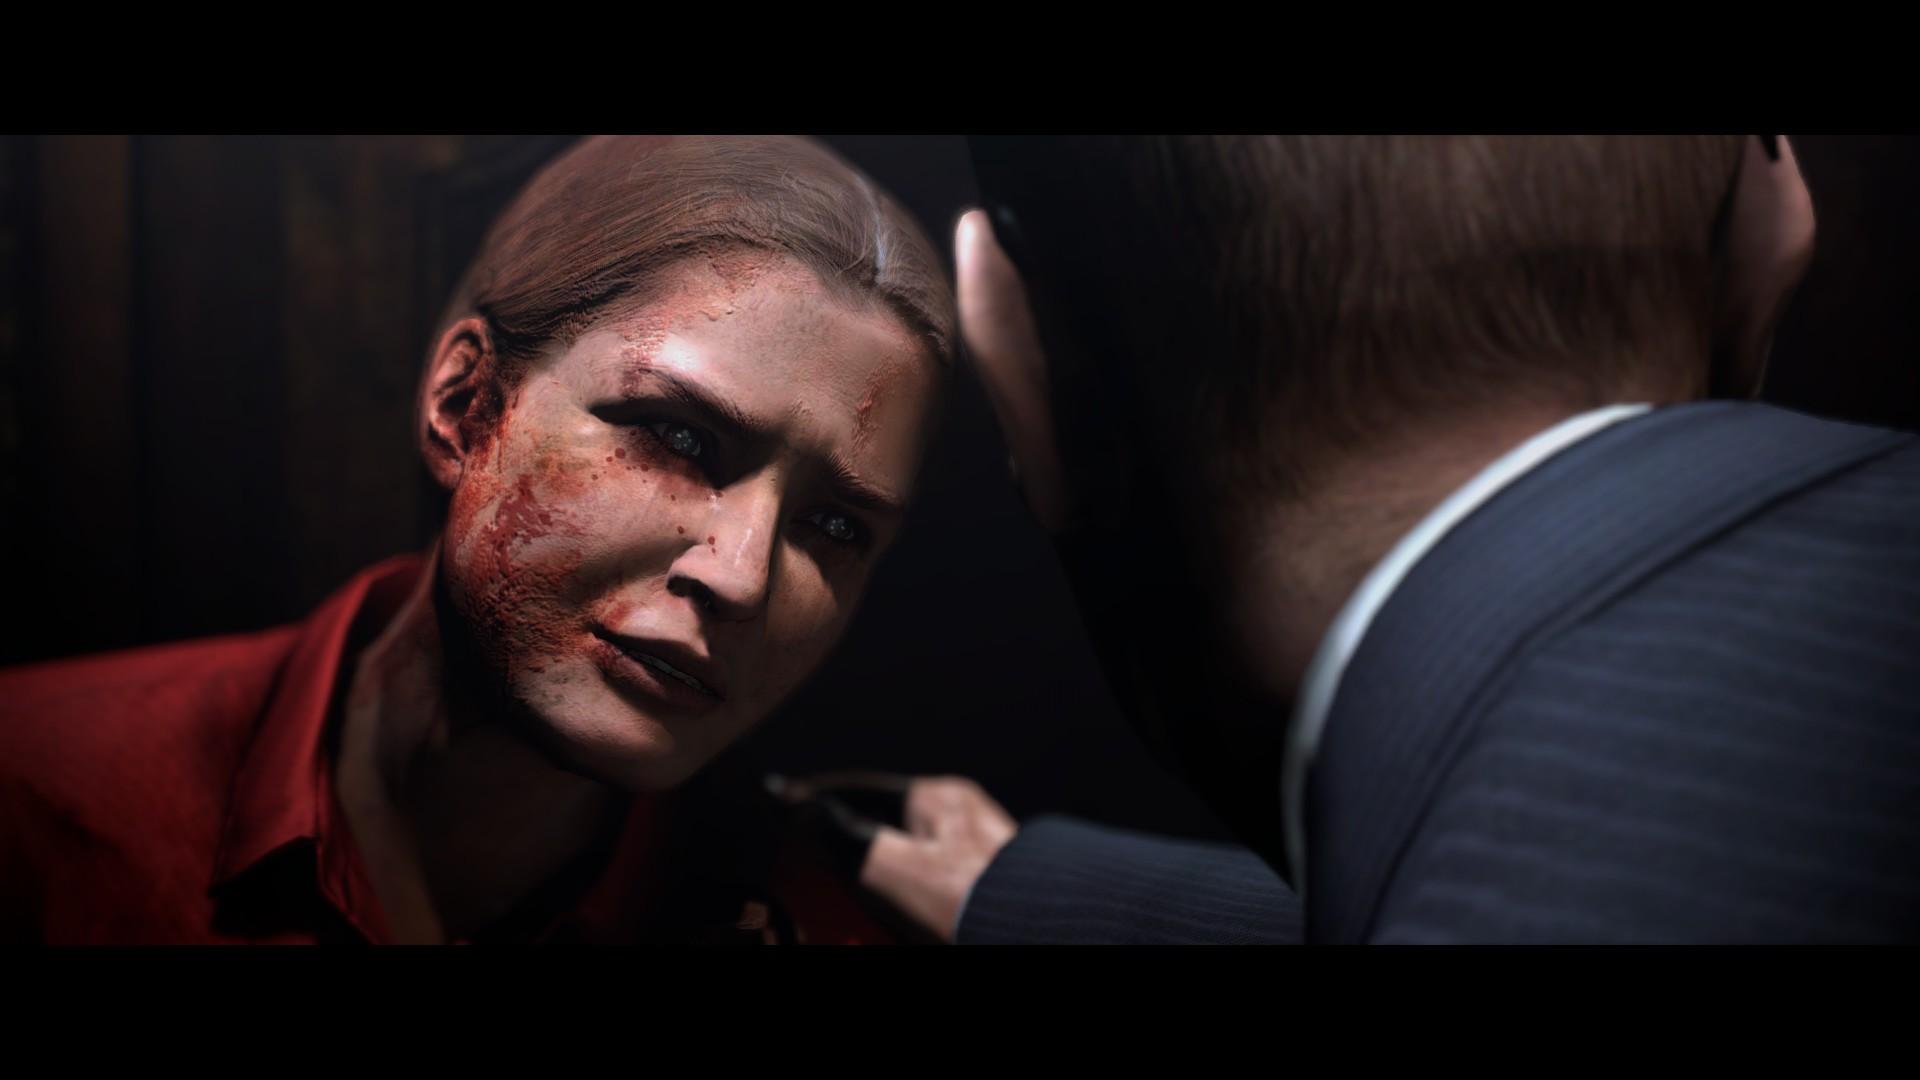 221040_screenshots_20170730110044_1.jpg - Resident Evil 6